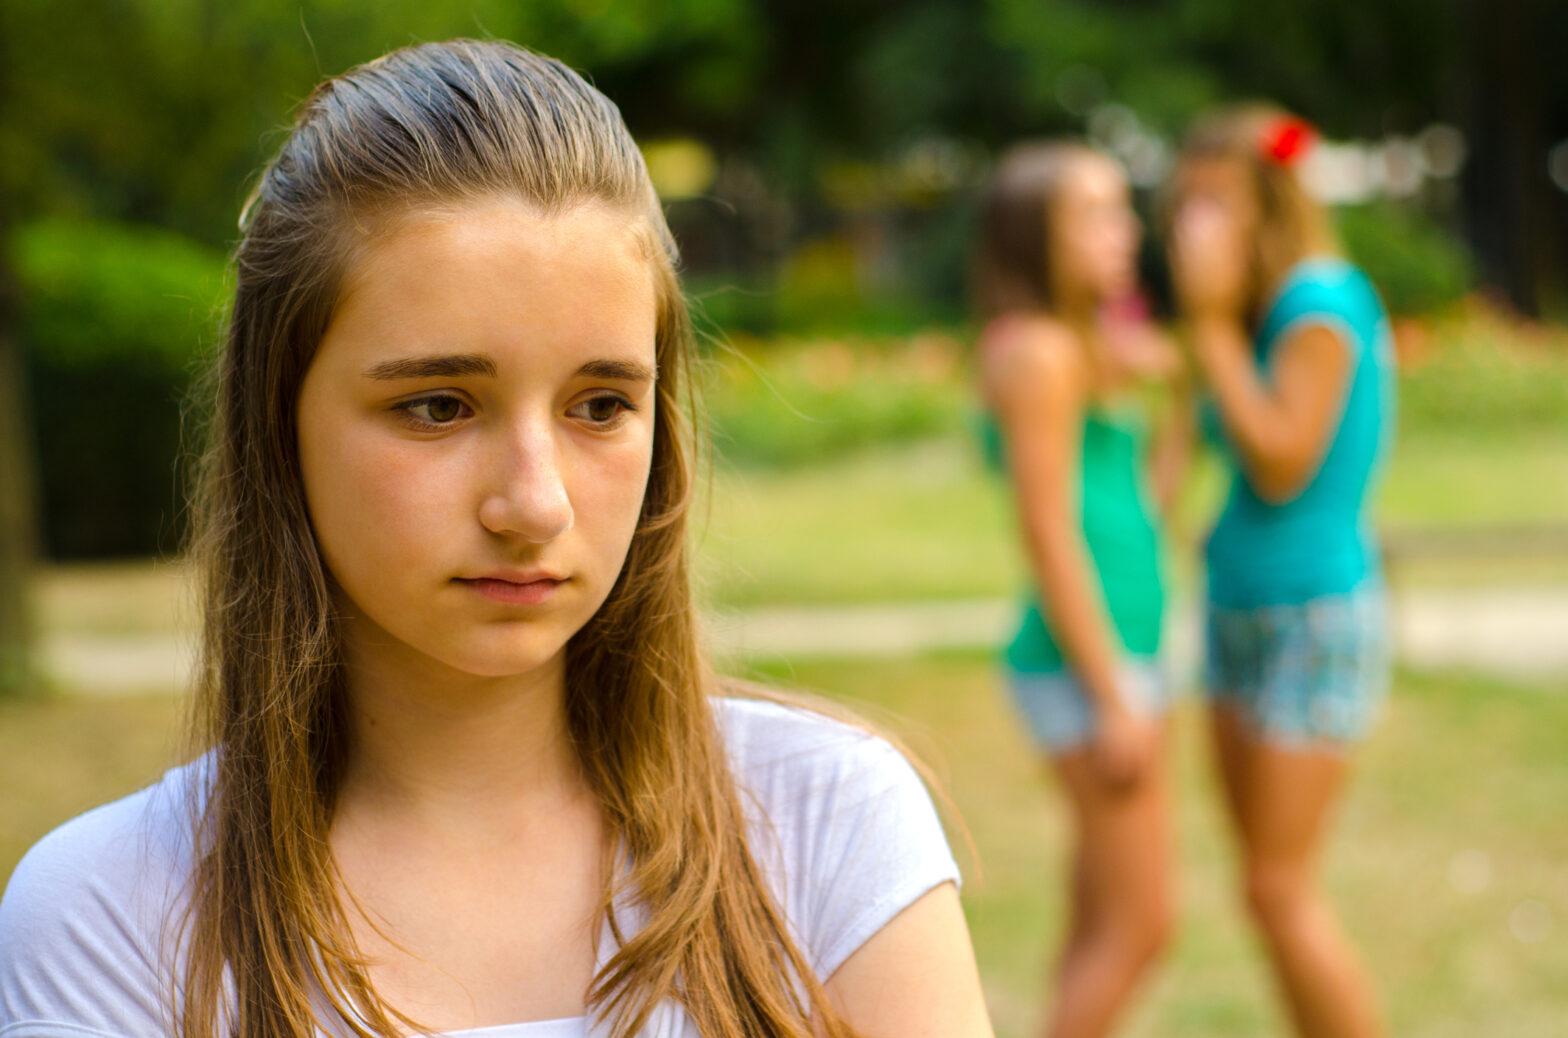 depression_in_children_adolescents